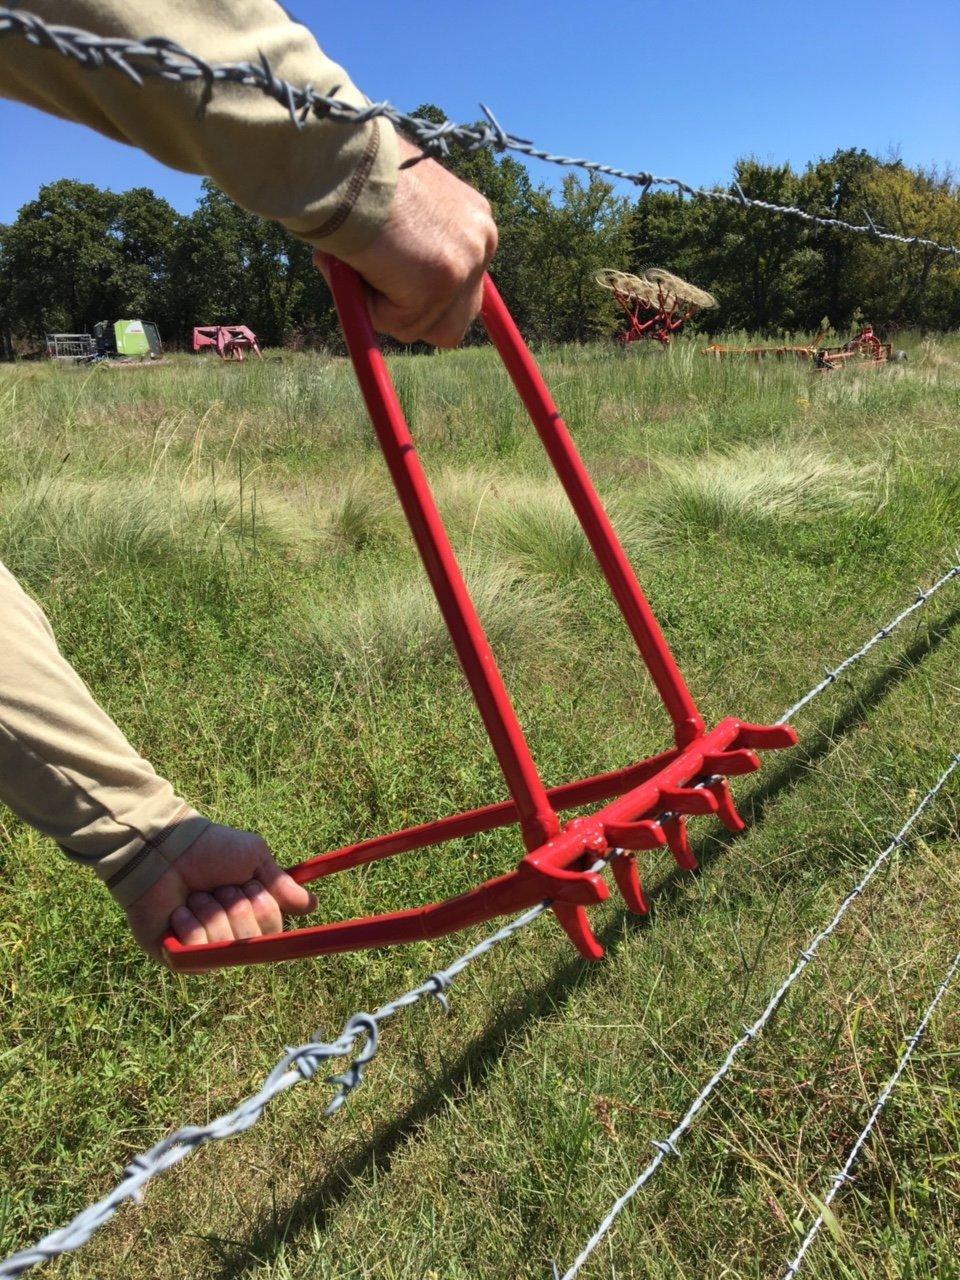 Wire Tight Fence Crimping Tool - - Amazon.com